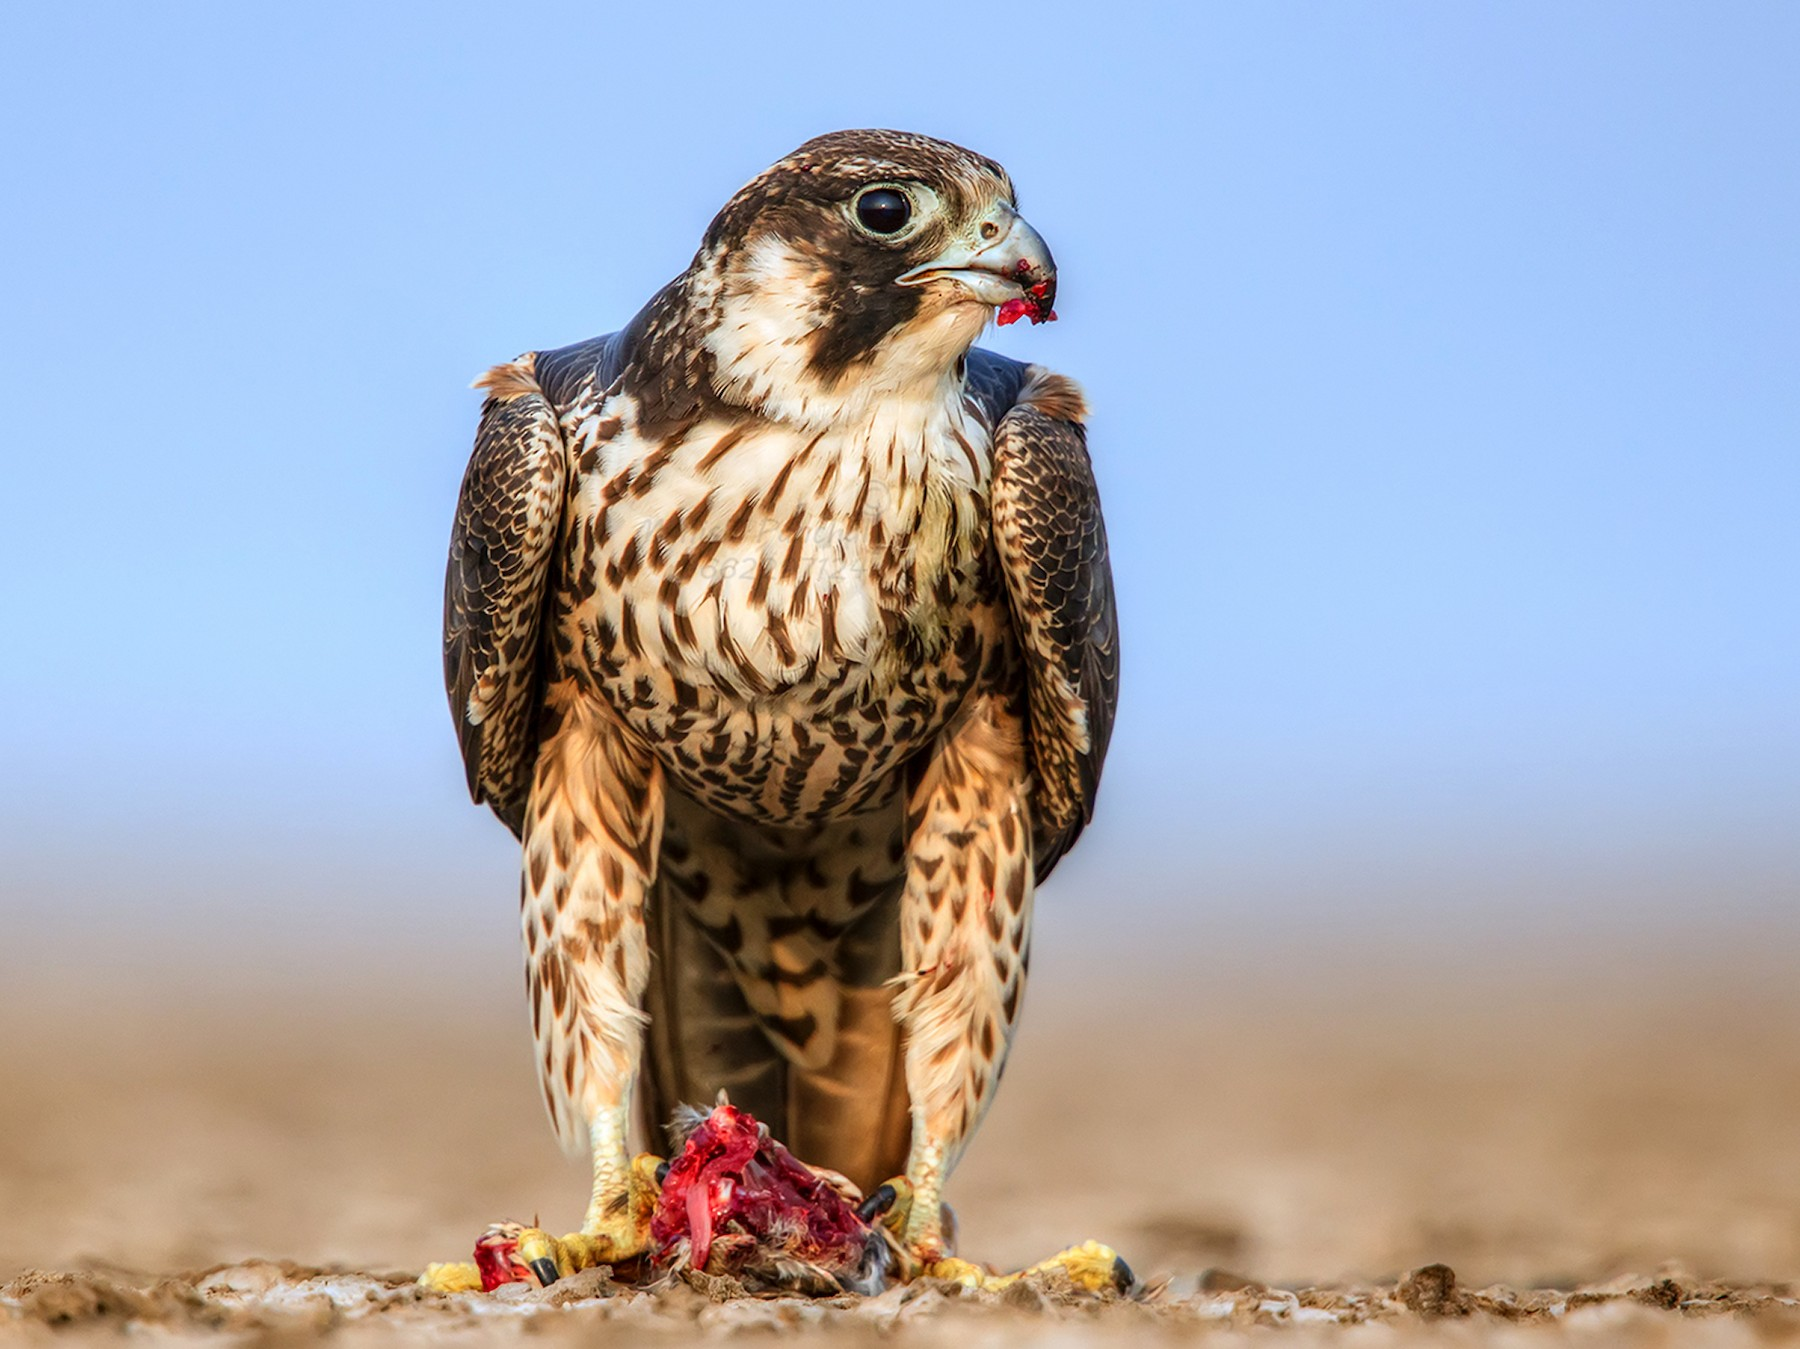 Peregrine Falcon - Manish Panchal